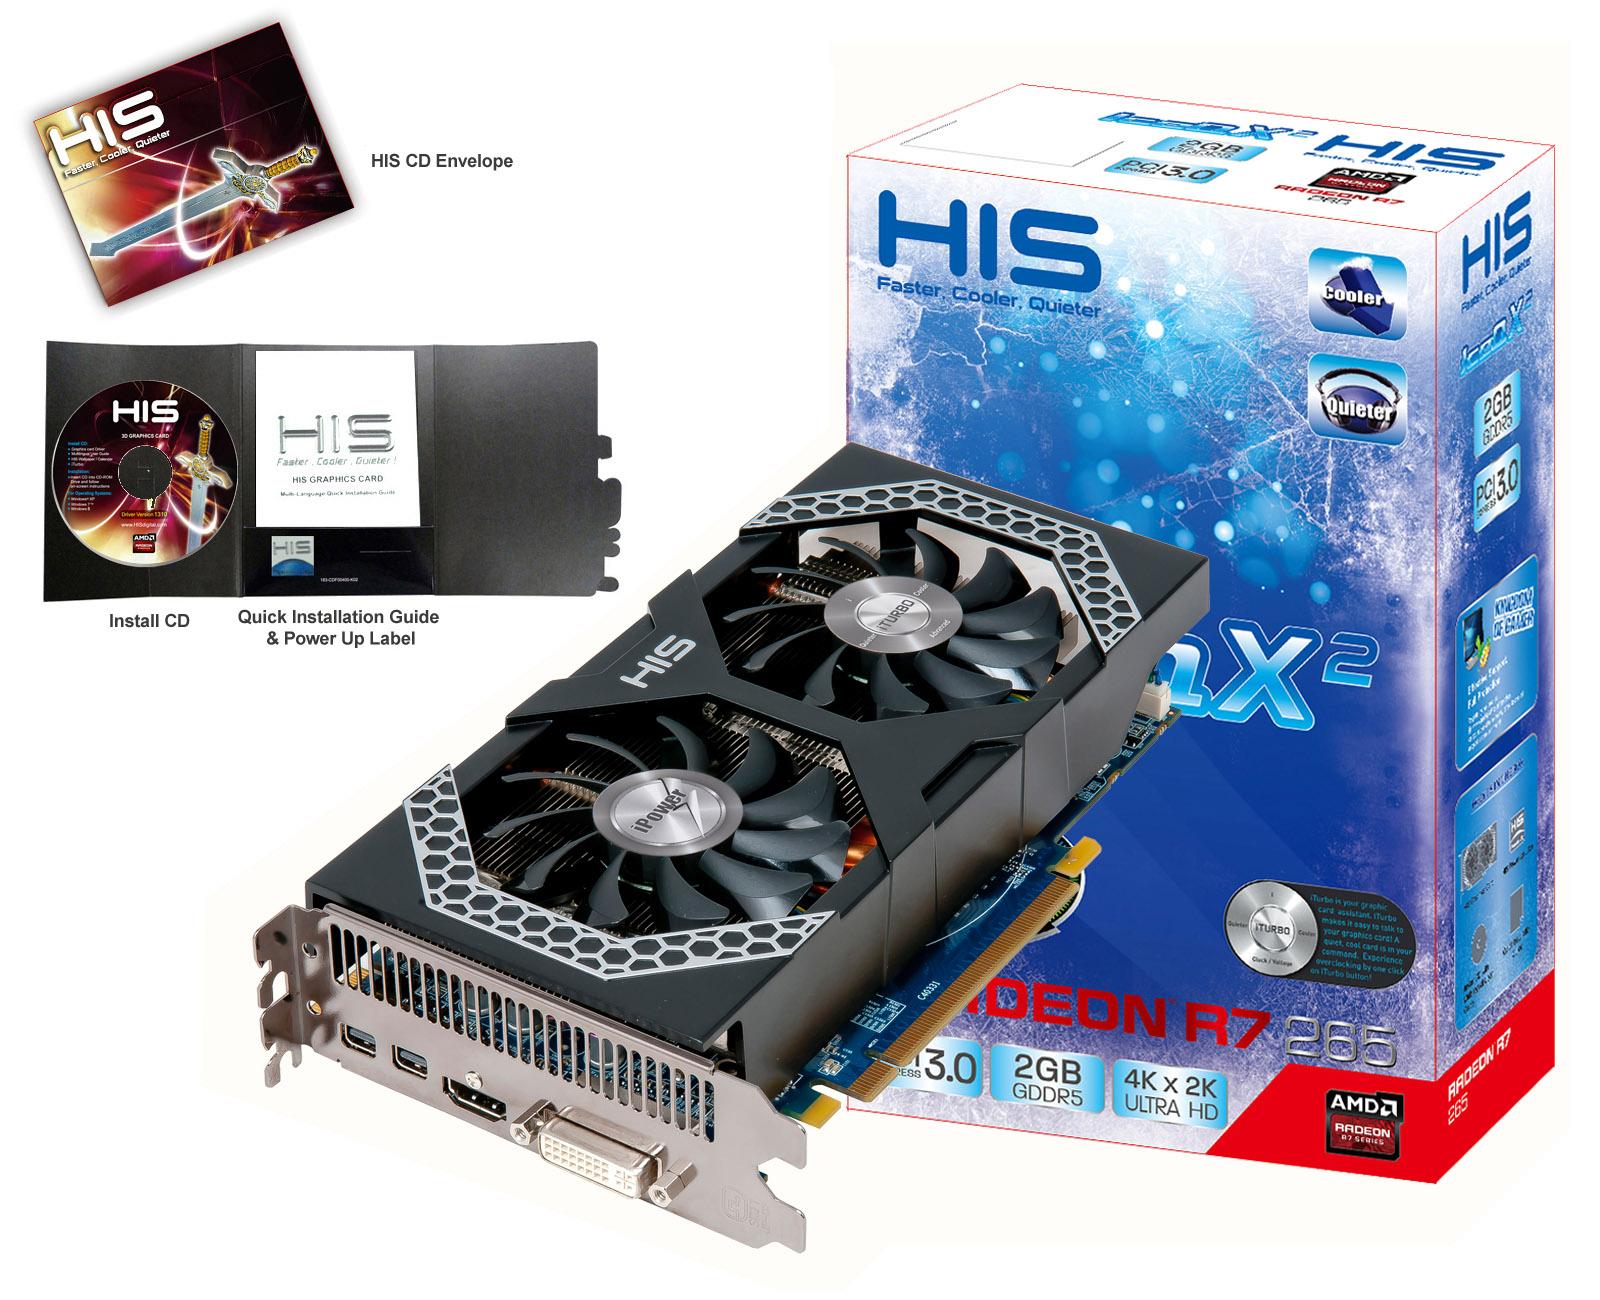 Hasil gambar untuk 1. IceQ HIS X2 2GB DDR5 R7 265-bit